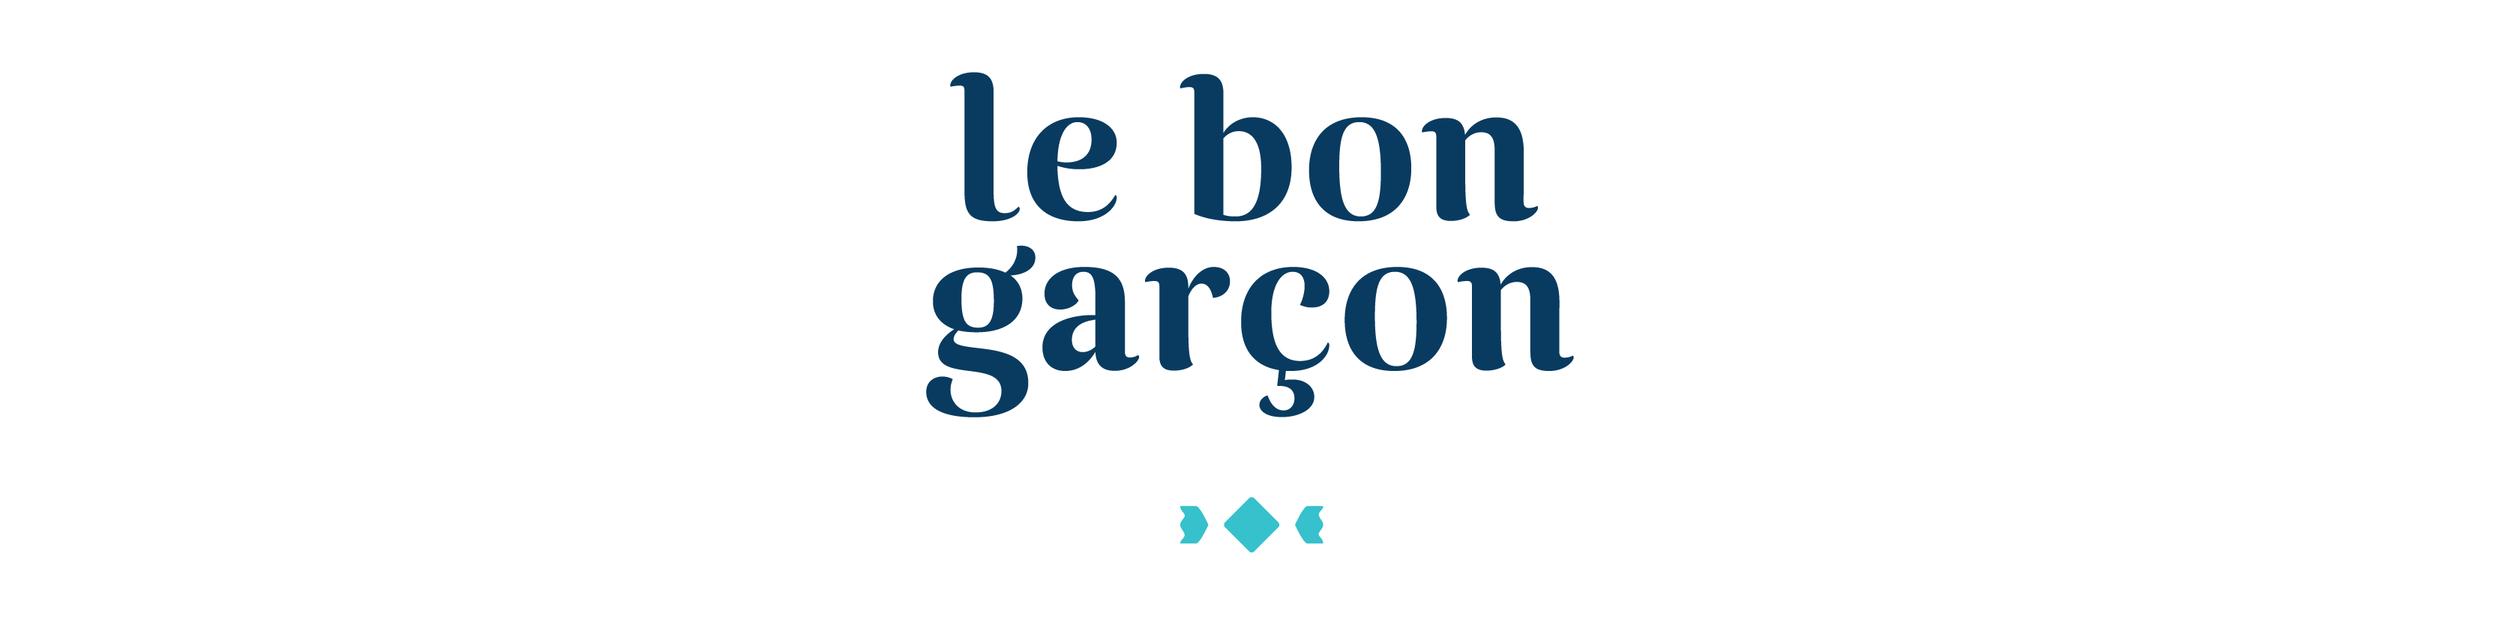 LeBonGarcon_logo_simple-01.png